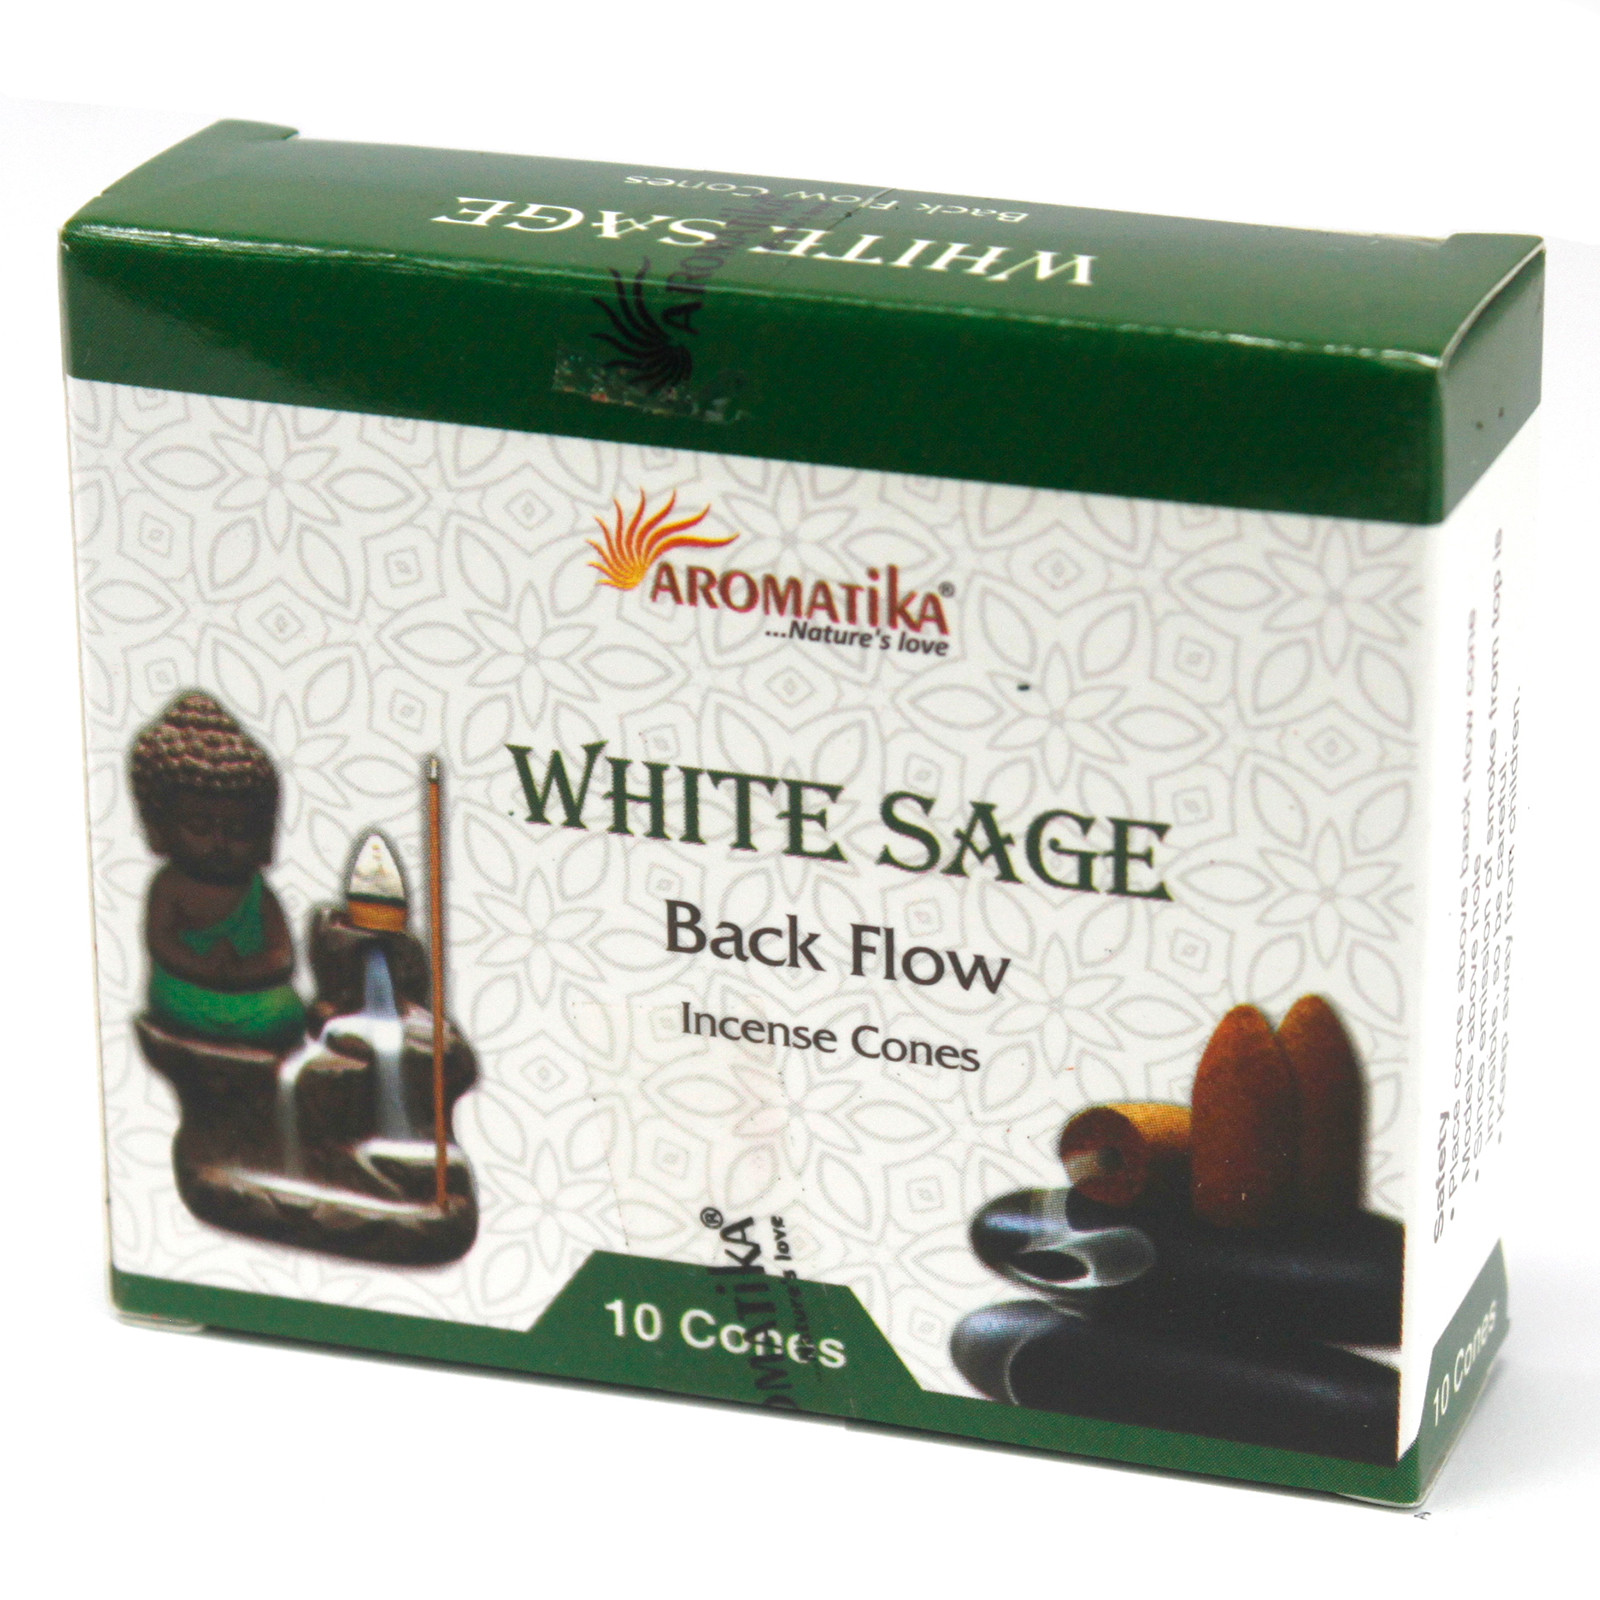 Aromatica Backflow Incense Cones White Sage